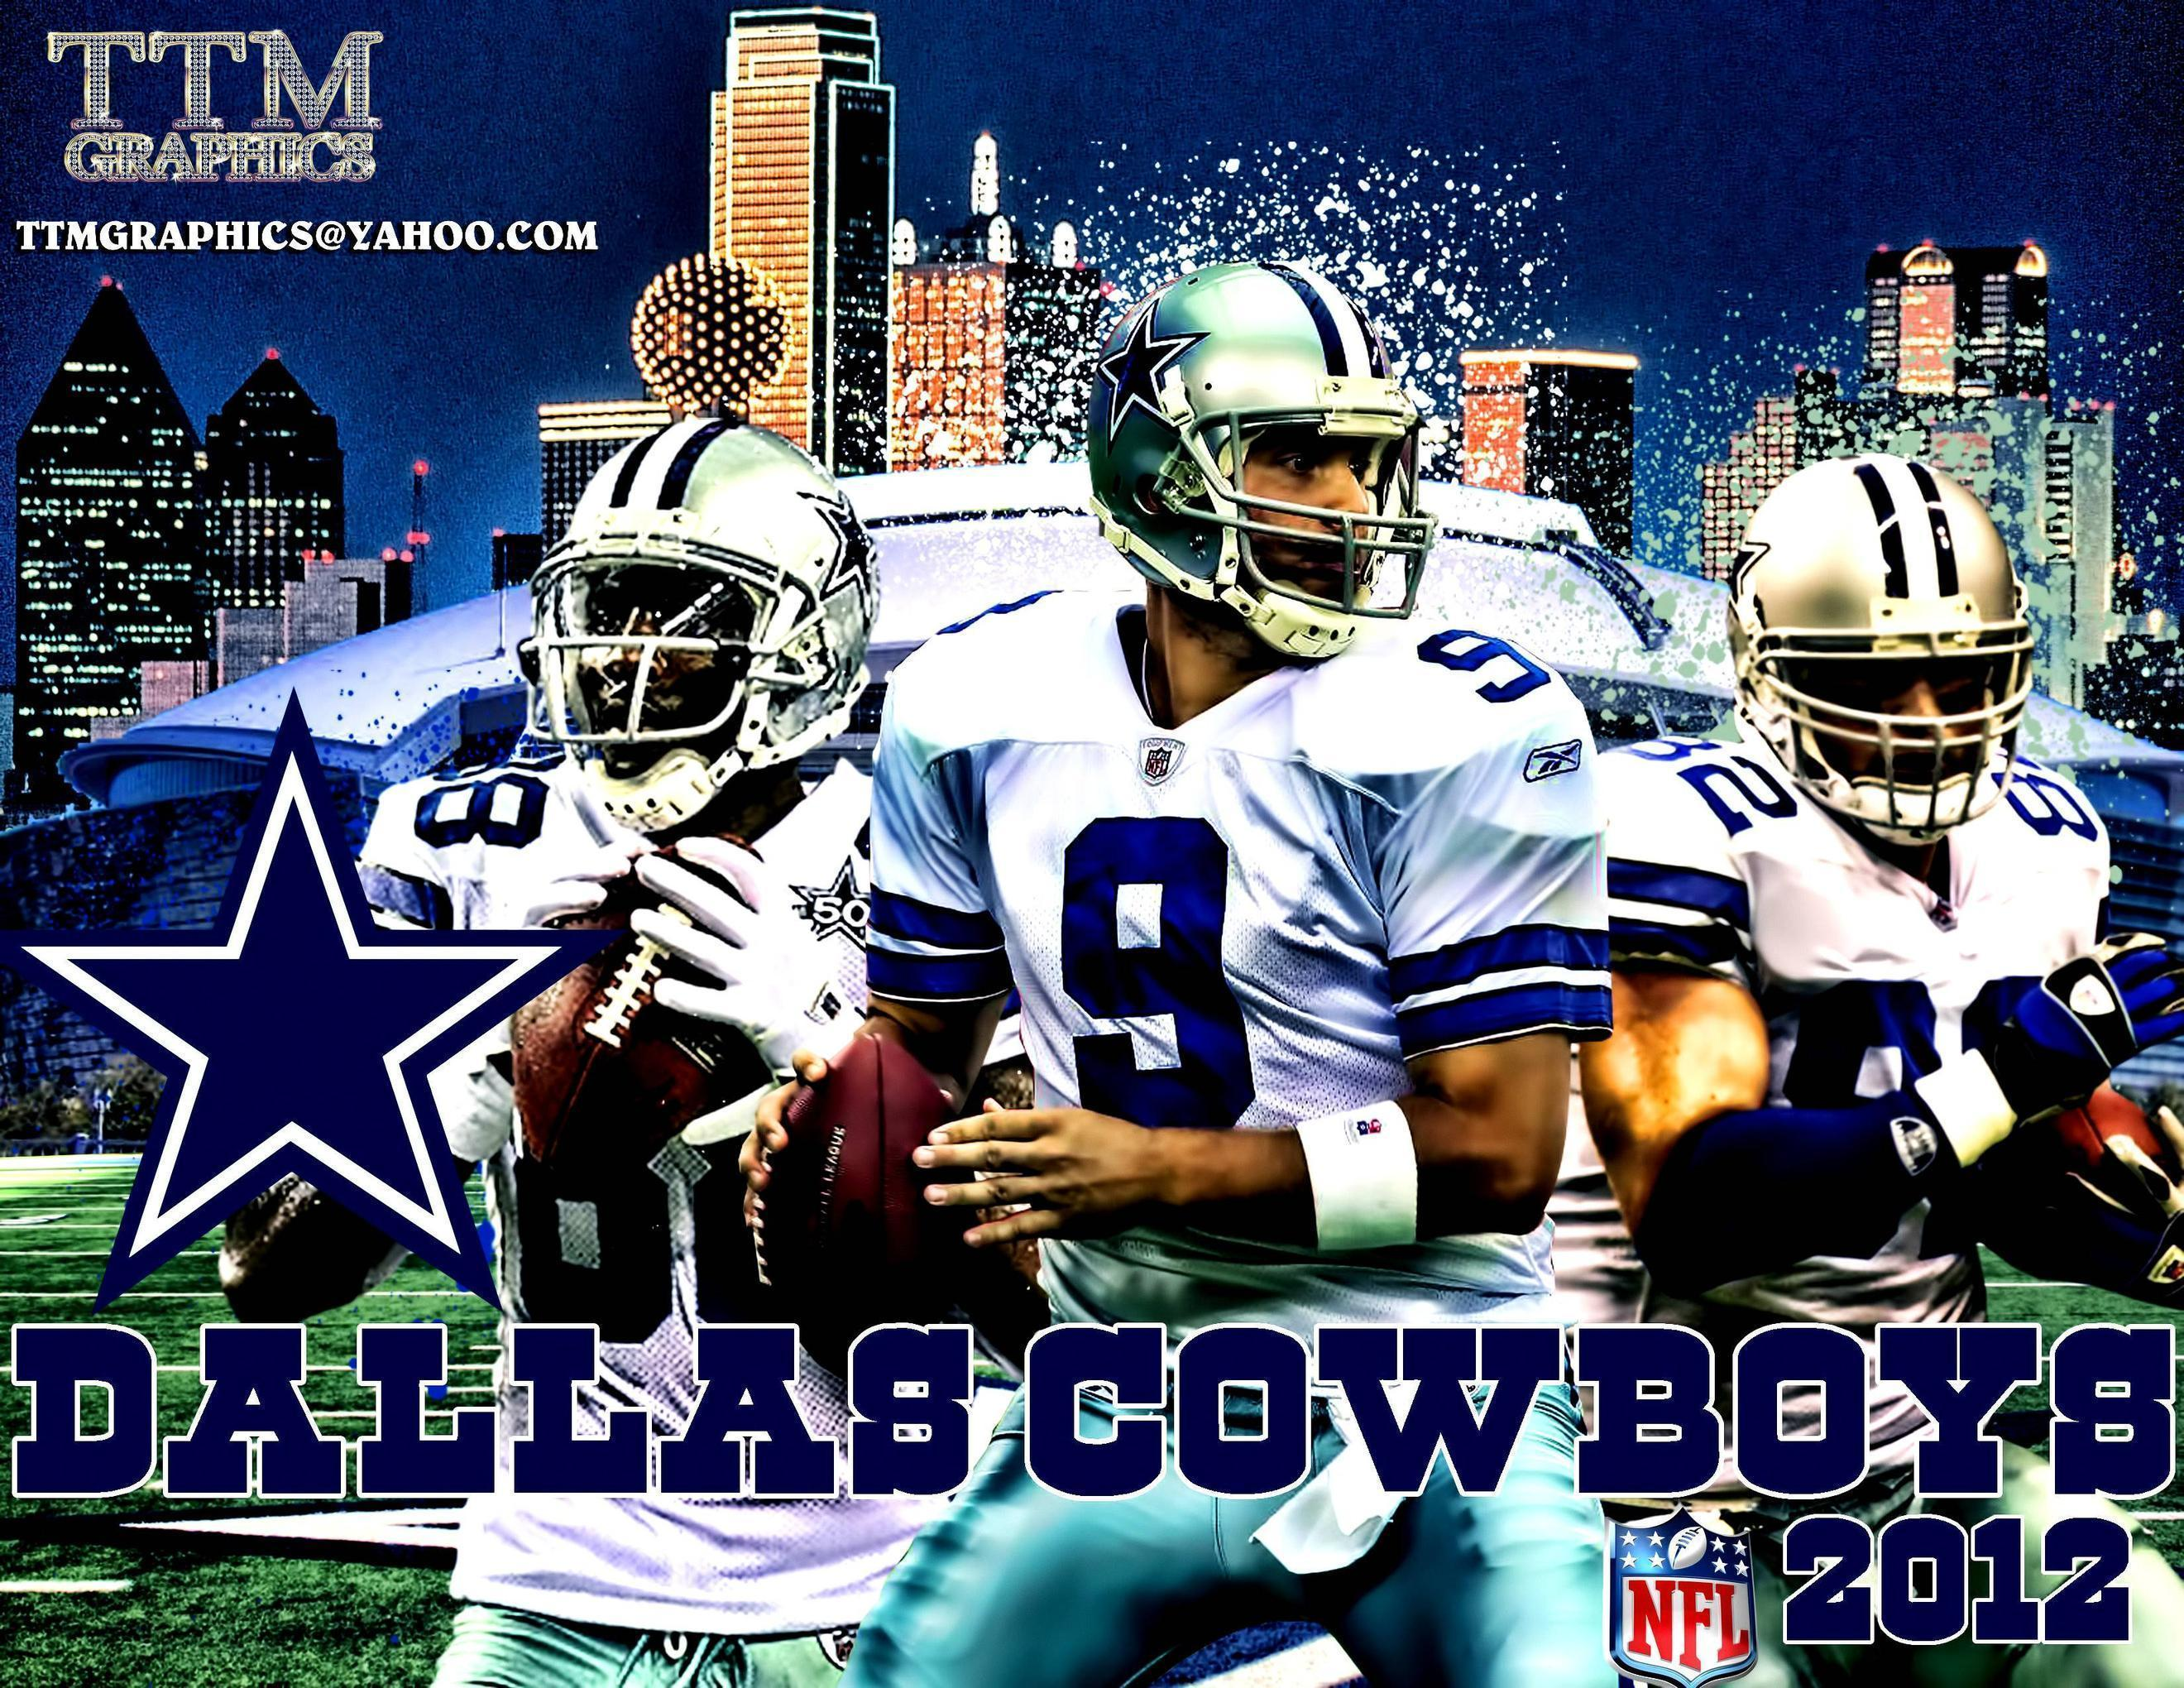 Wallpaper downloader - Football Dallas Cowboys Hd Background Wallpaper Wallpapers